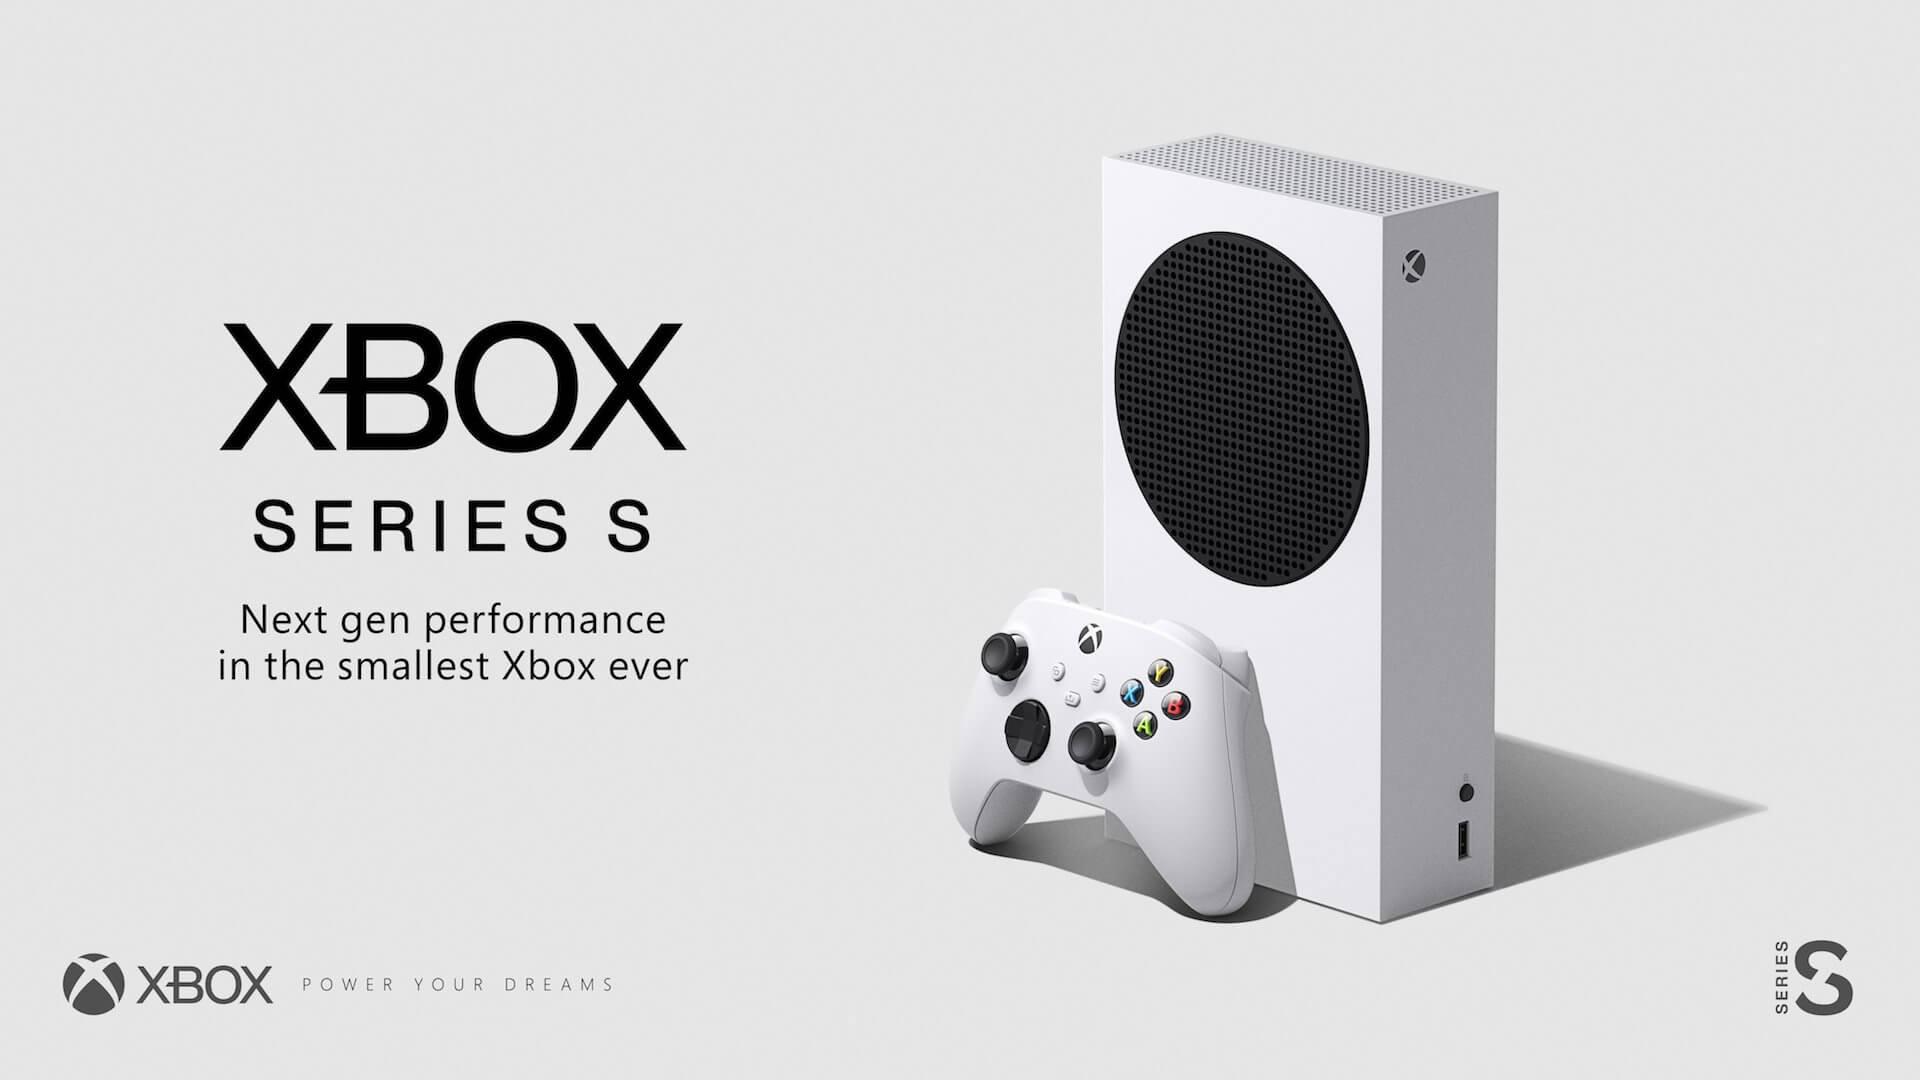 Xbox史上最も小さいモデル「Xbox Series S」が正式発表!299ドルで発売へ tech200908_xboxseriess_1